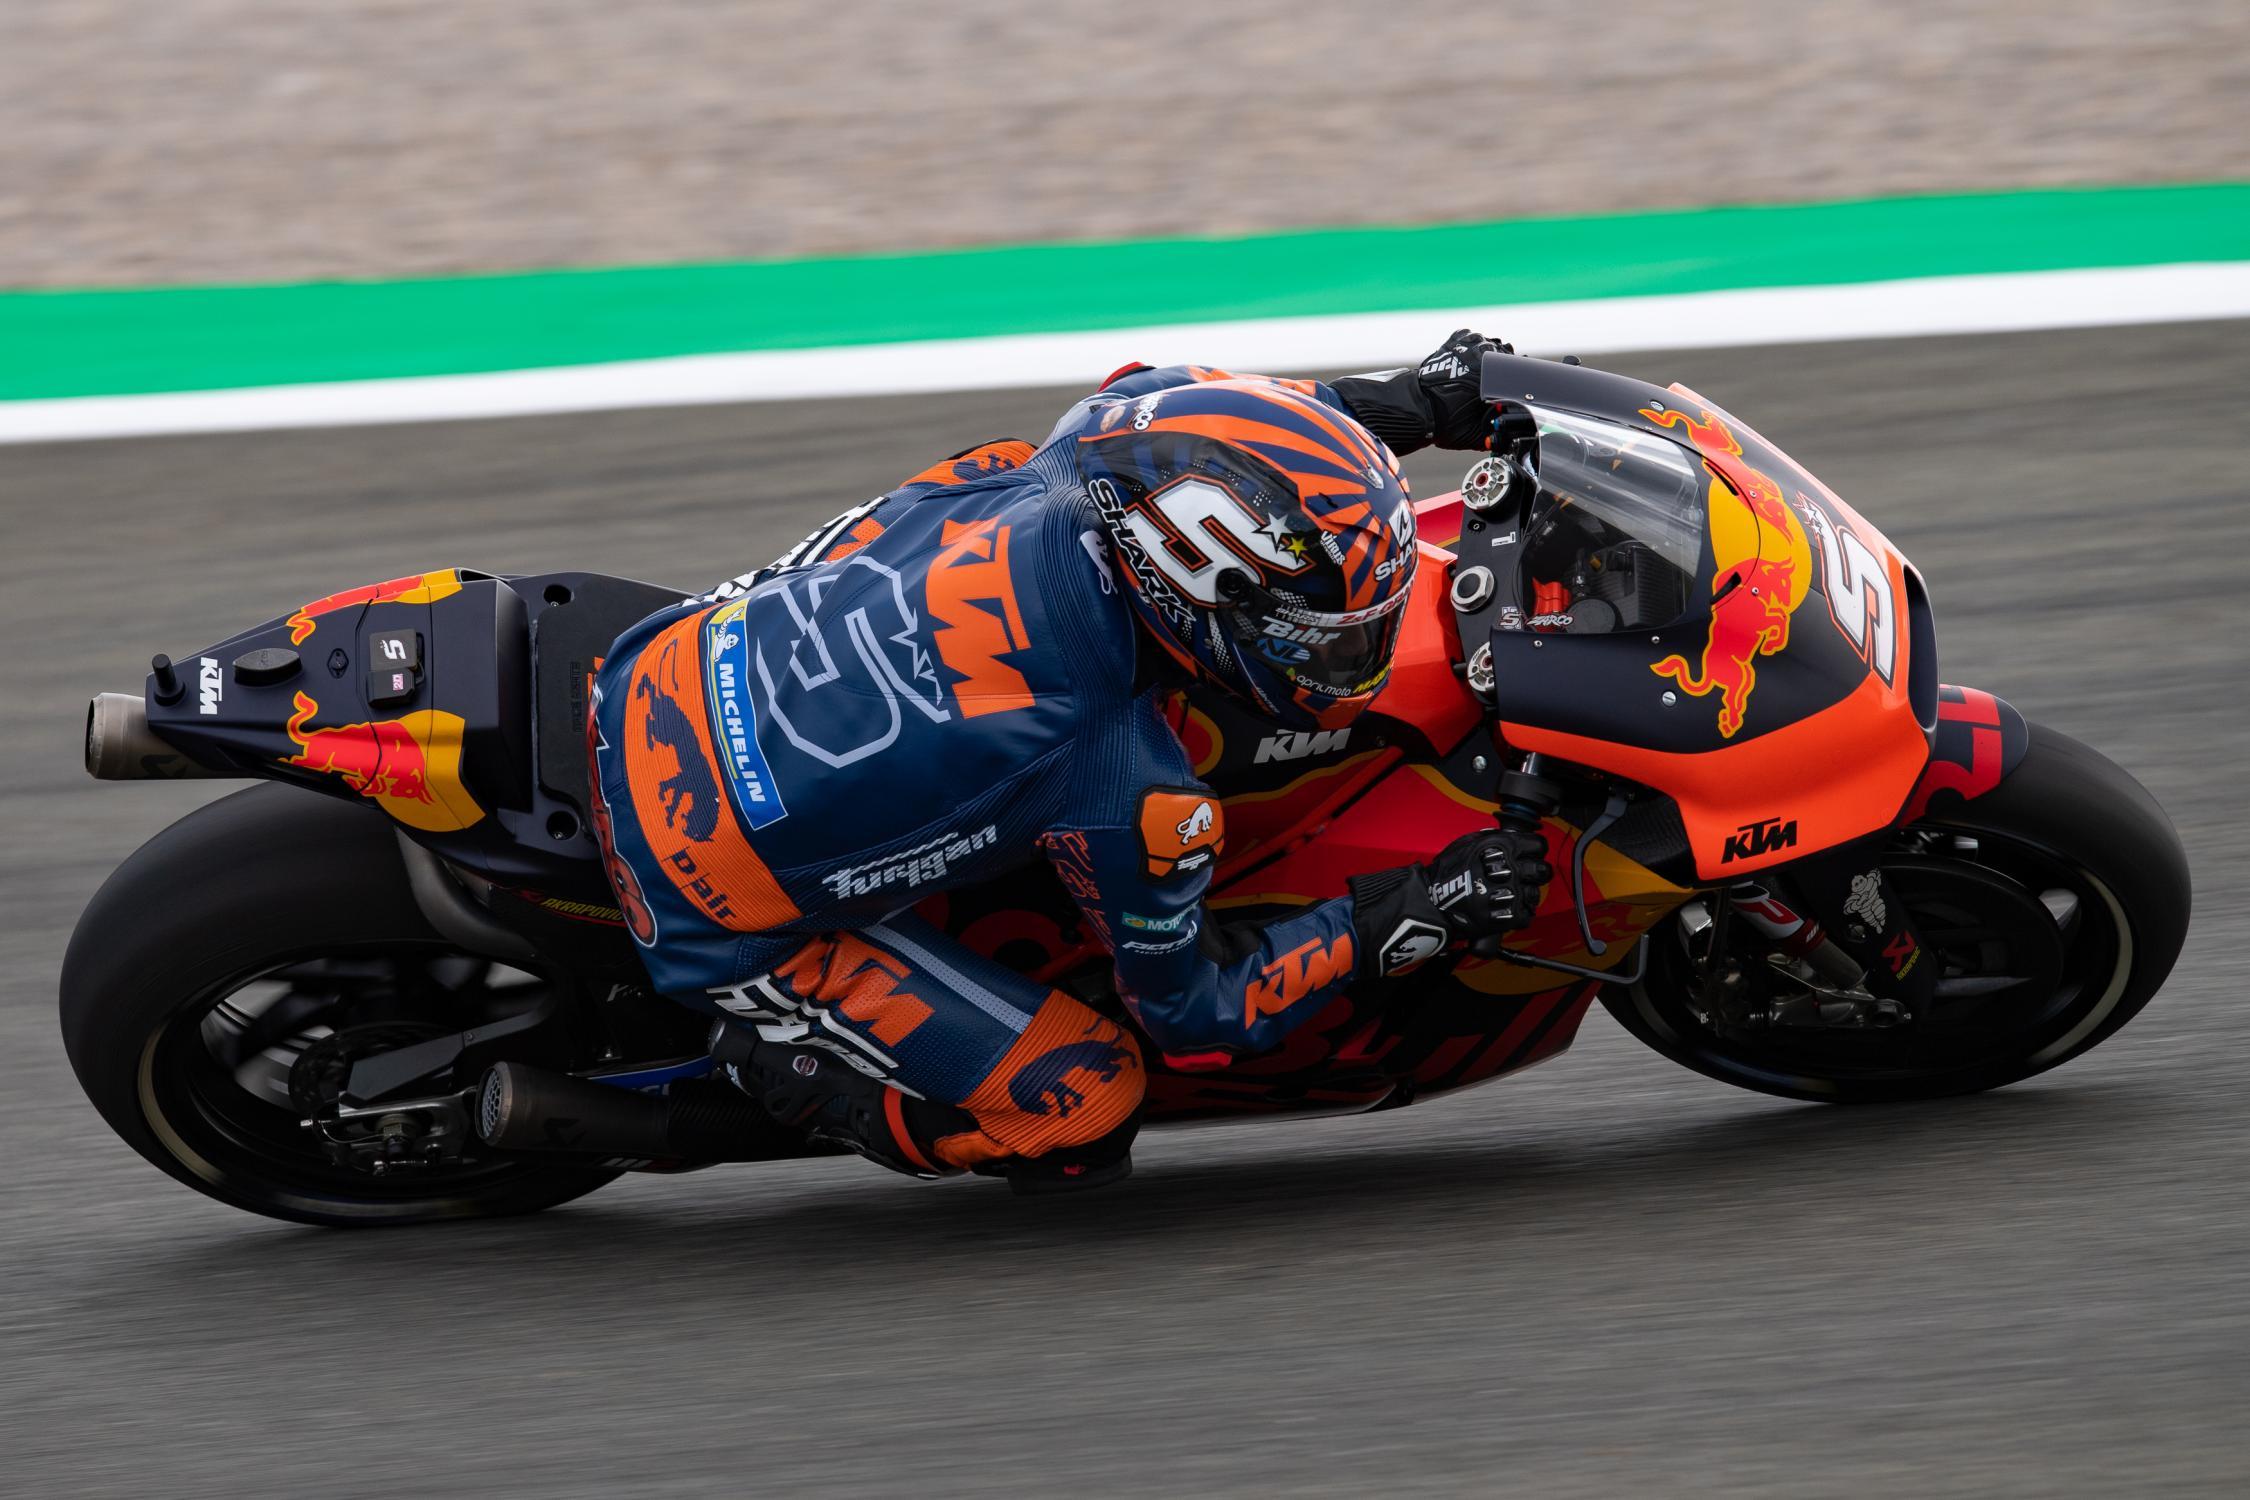 MOTO GP 2019 COMPÉTITIONS Johann-zarco-valenciatest-j2-motogp-2018